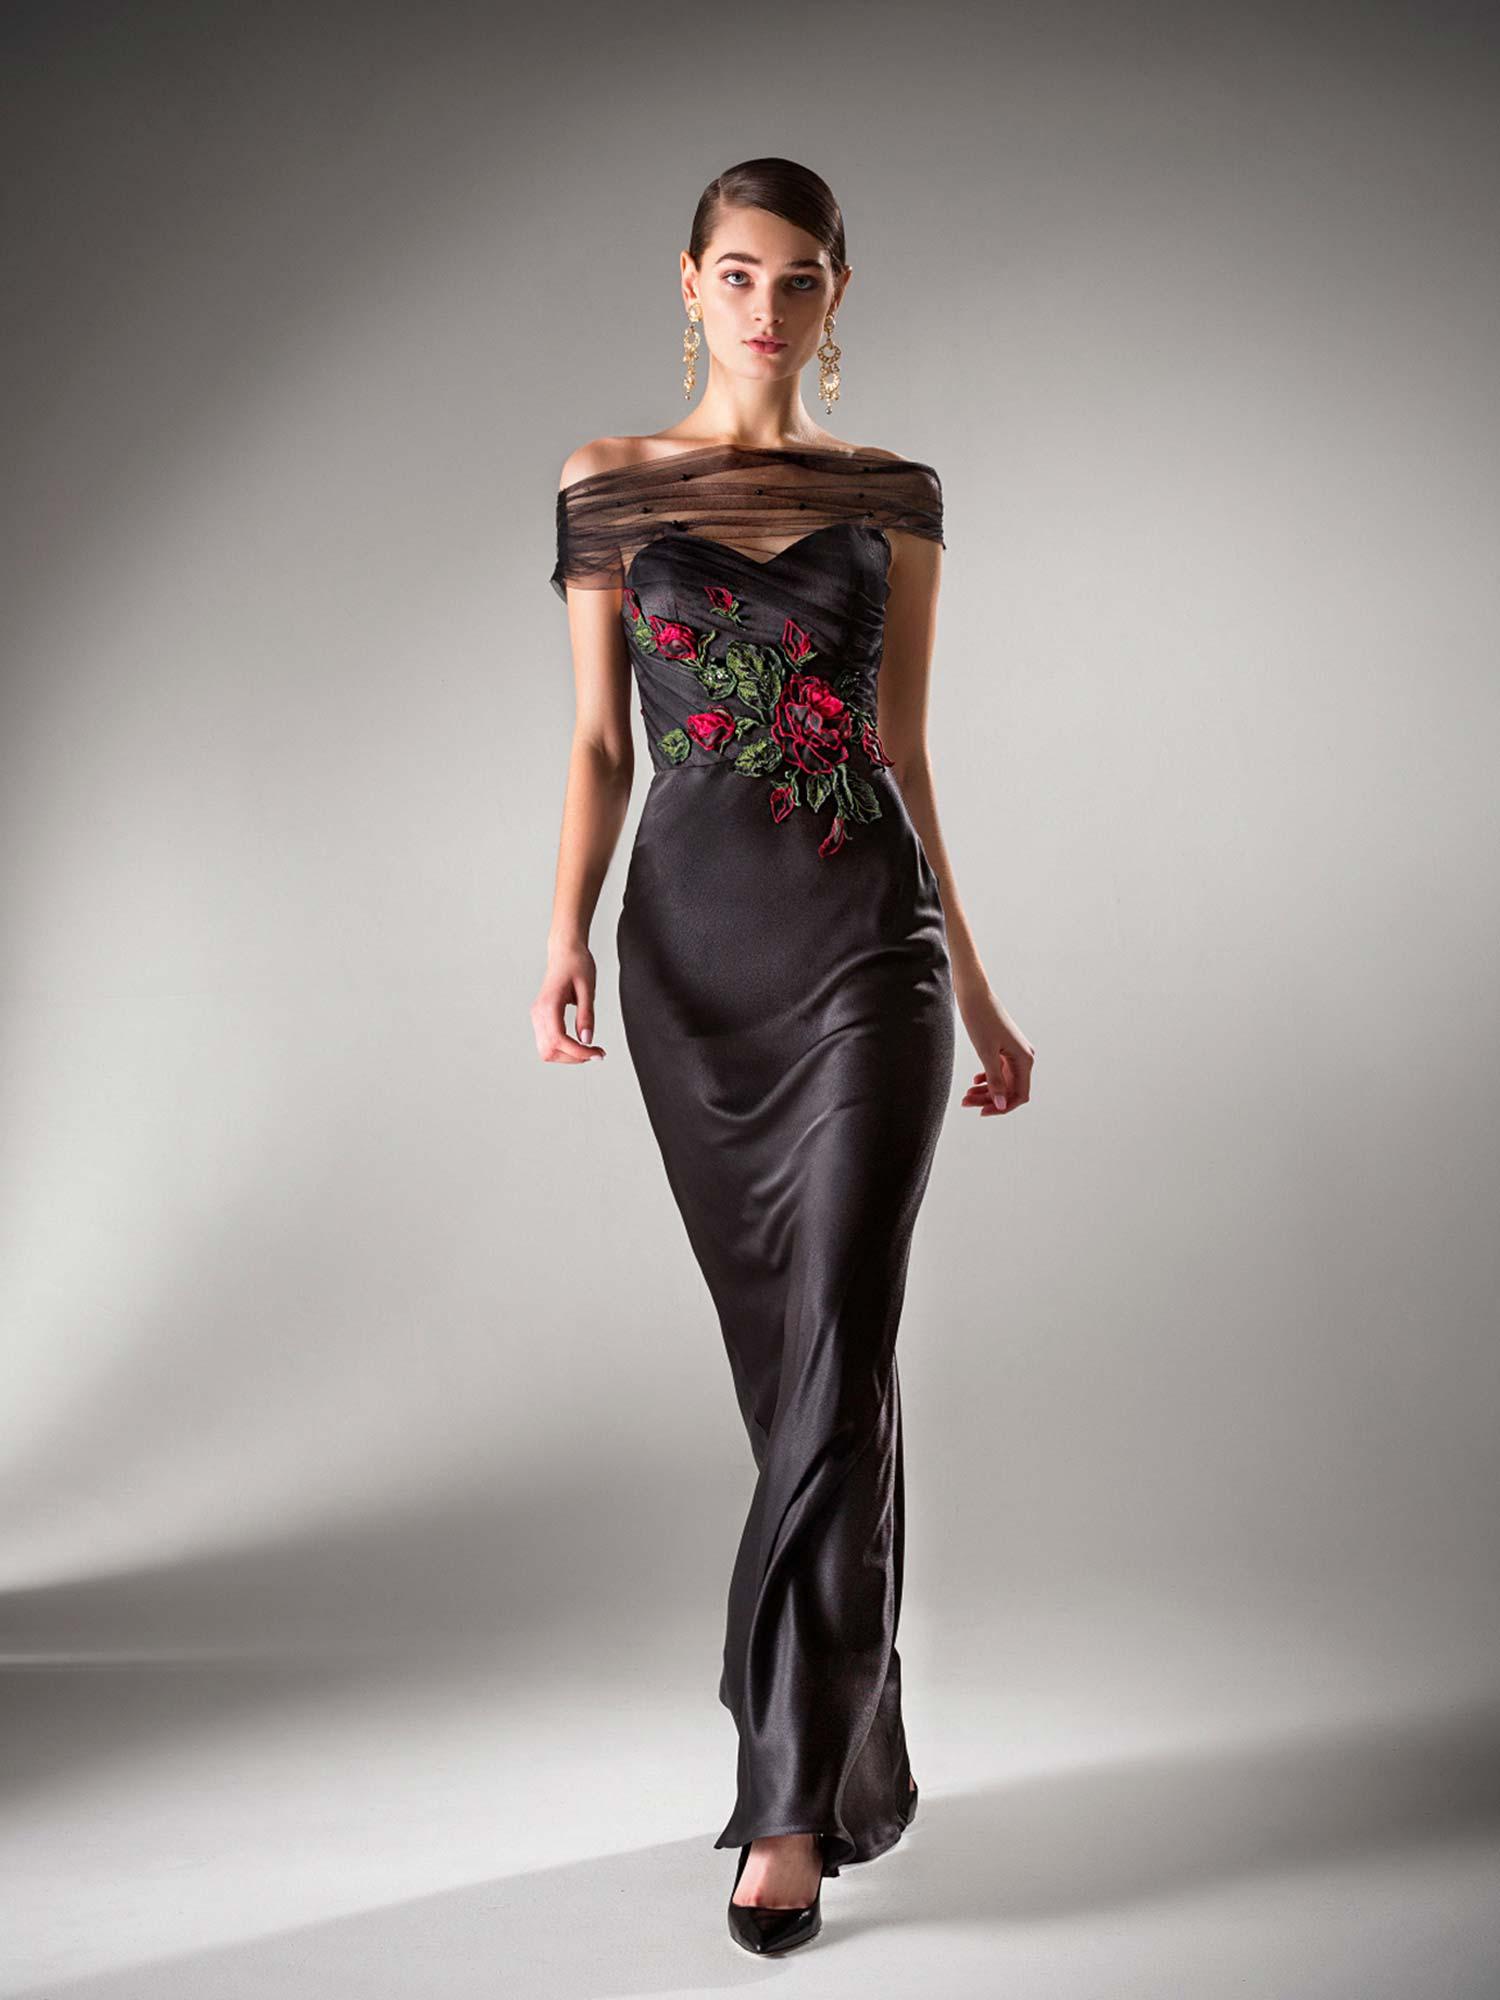 Style #407